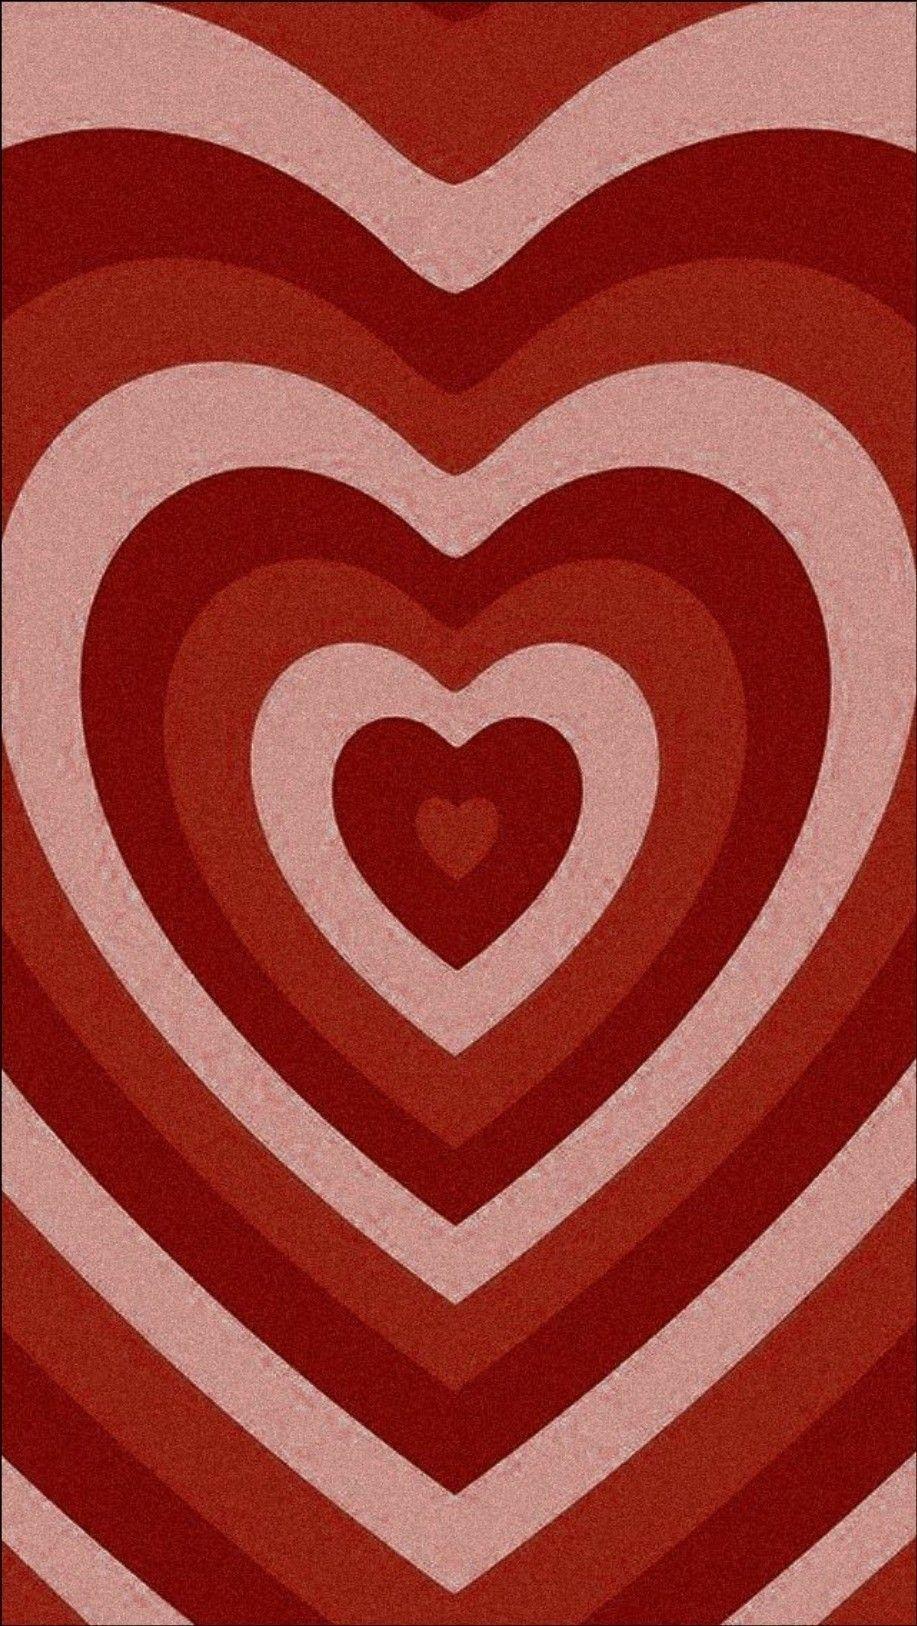 Indie Purpule Heart   Hippie Wallpaper, Heart Wallpaper